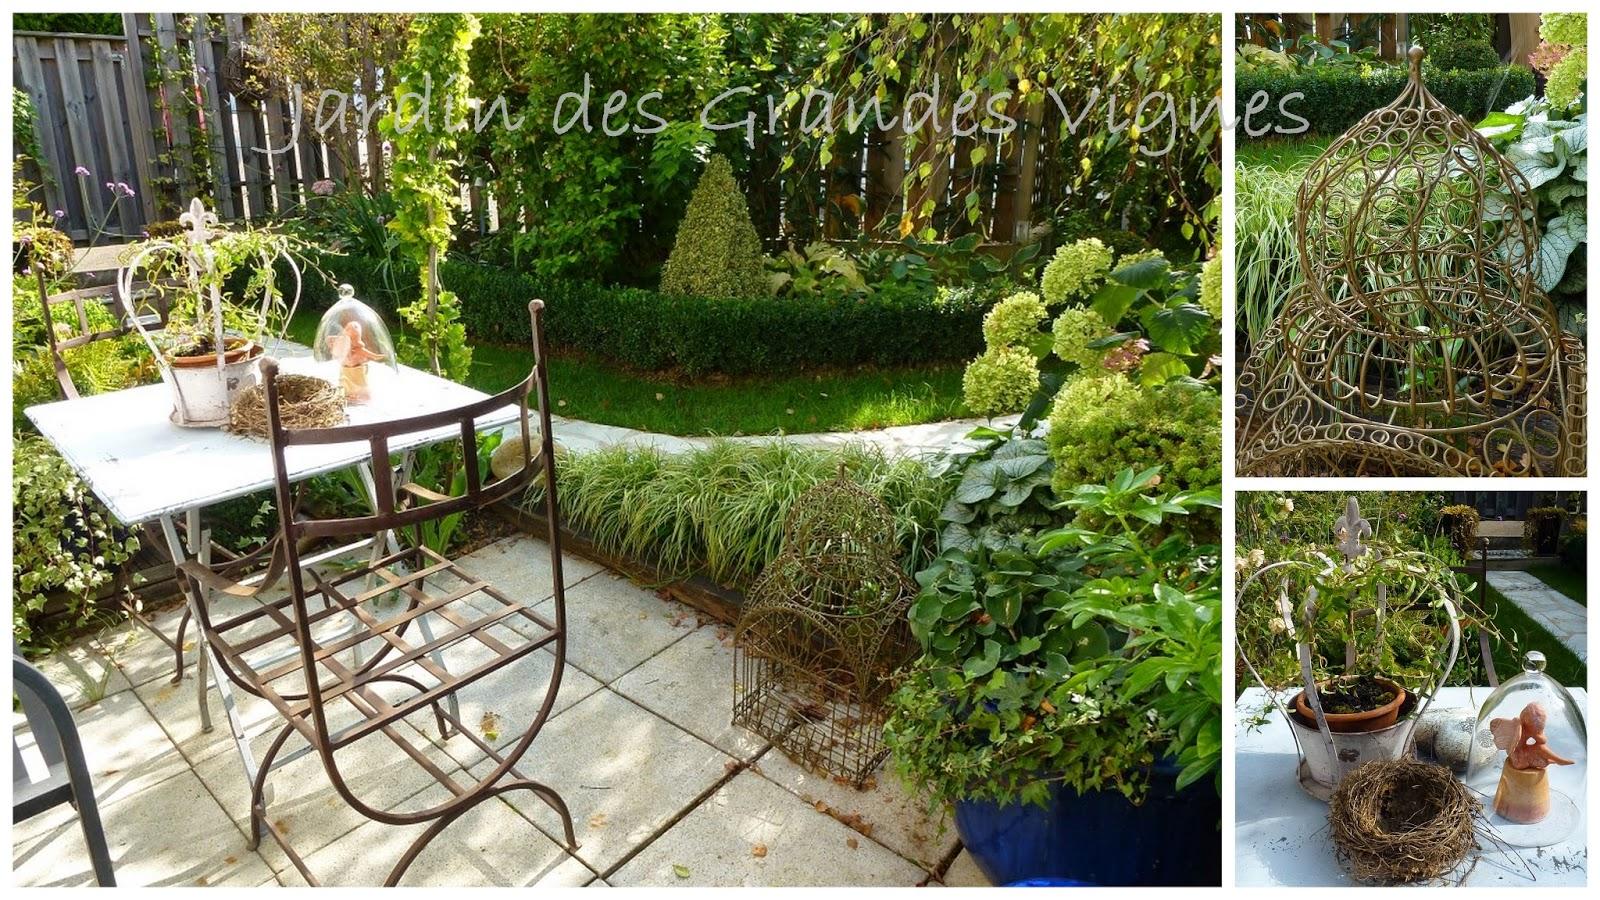 Le jardin des grandes vignes le jardin en septembre 1 - Le jardin des grandes vignes ...